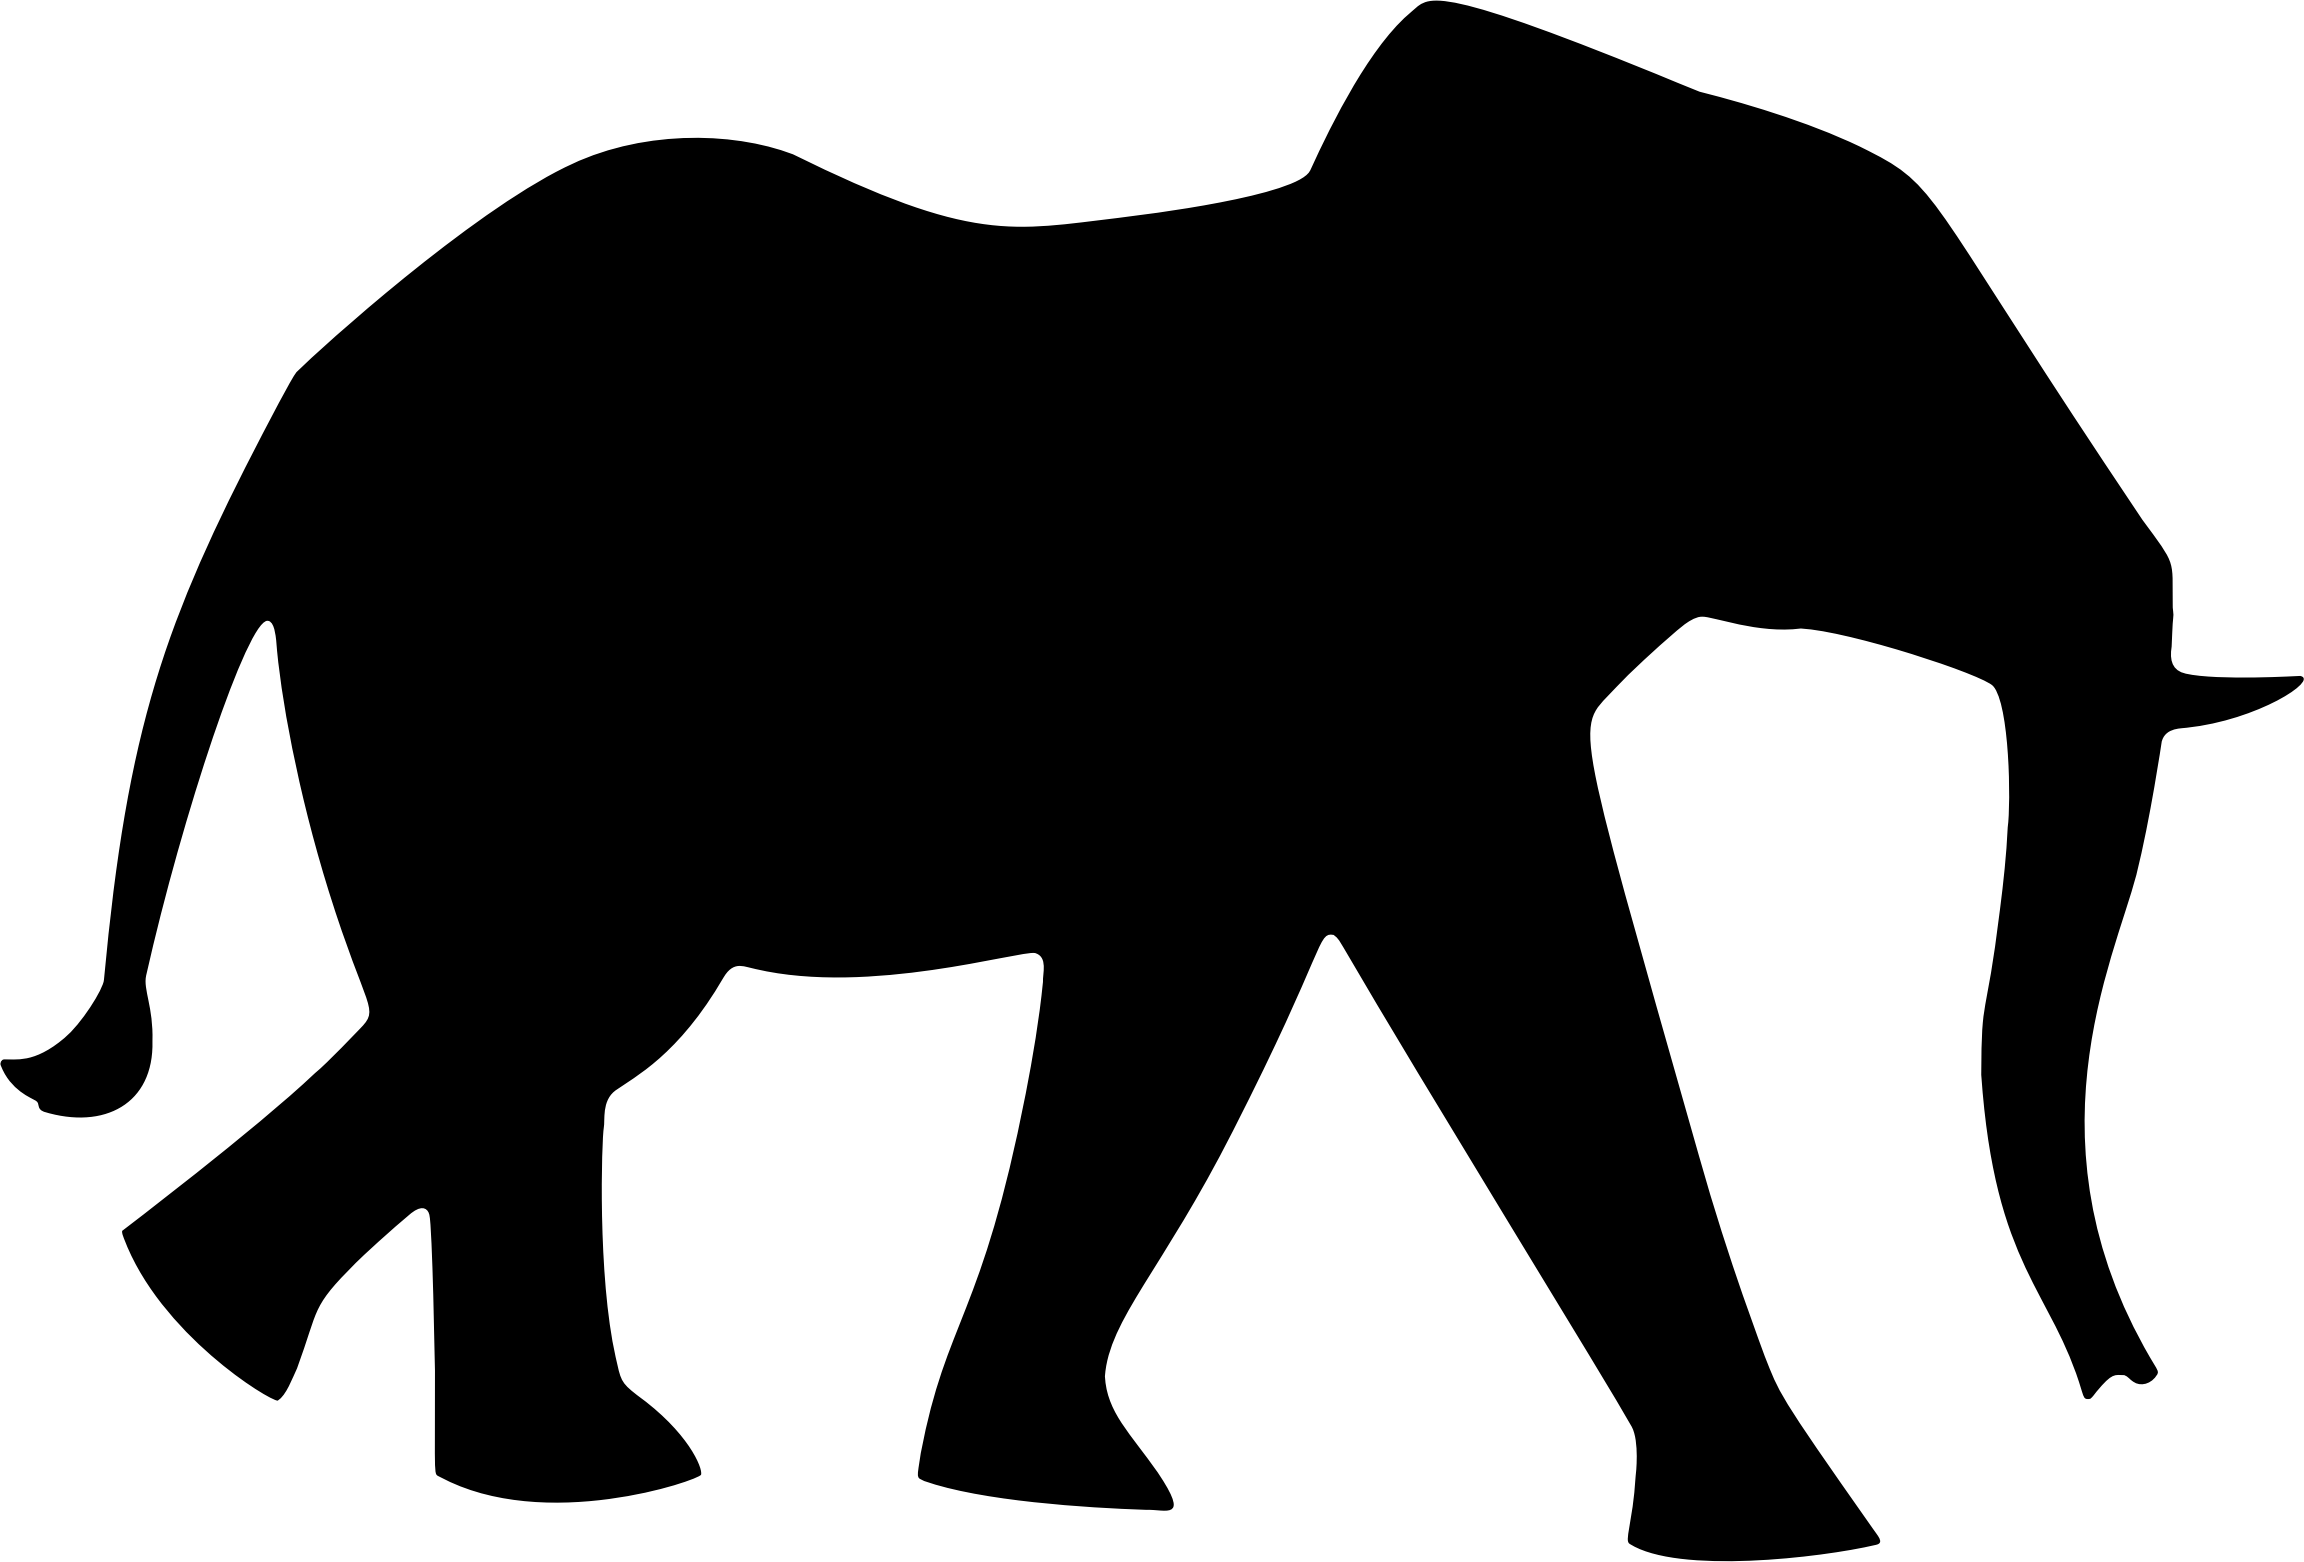 elephant silhouette 3